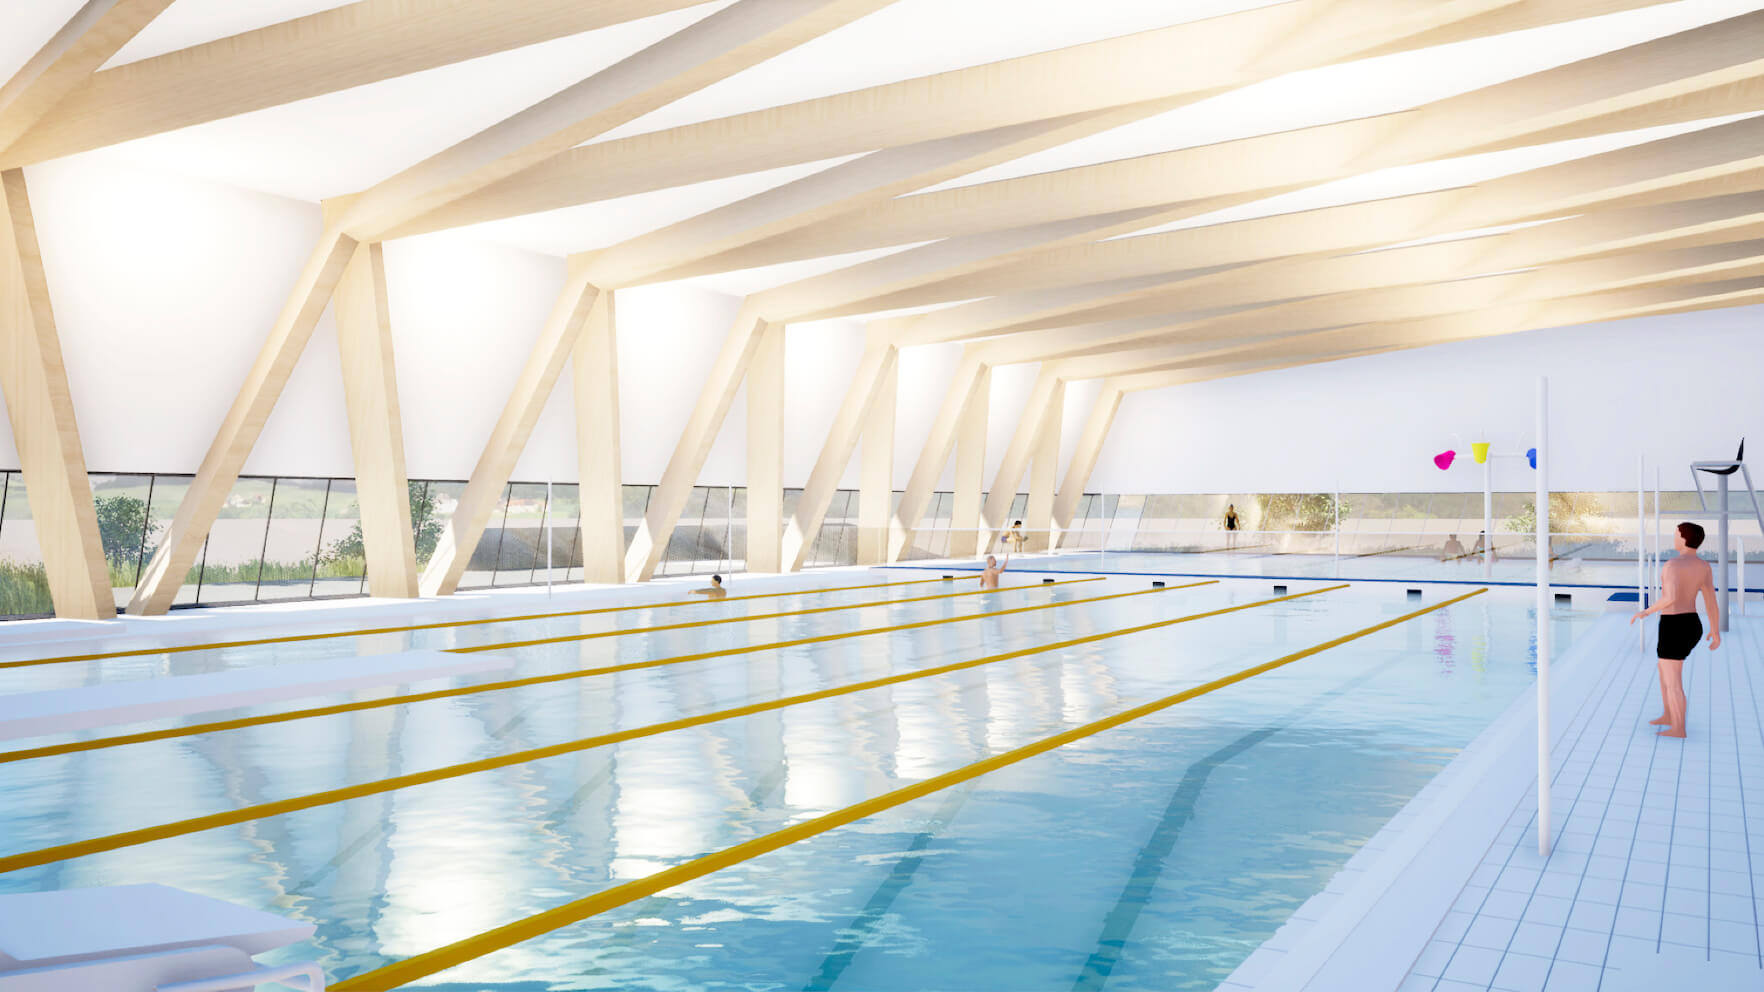 Complexe aquatique Matane piscine projet